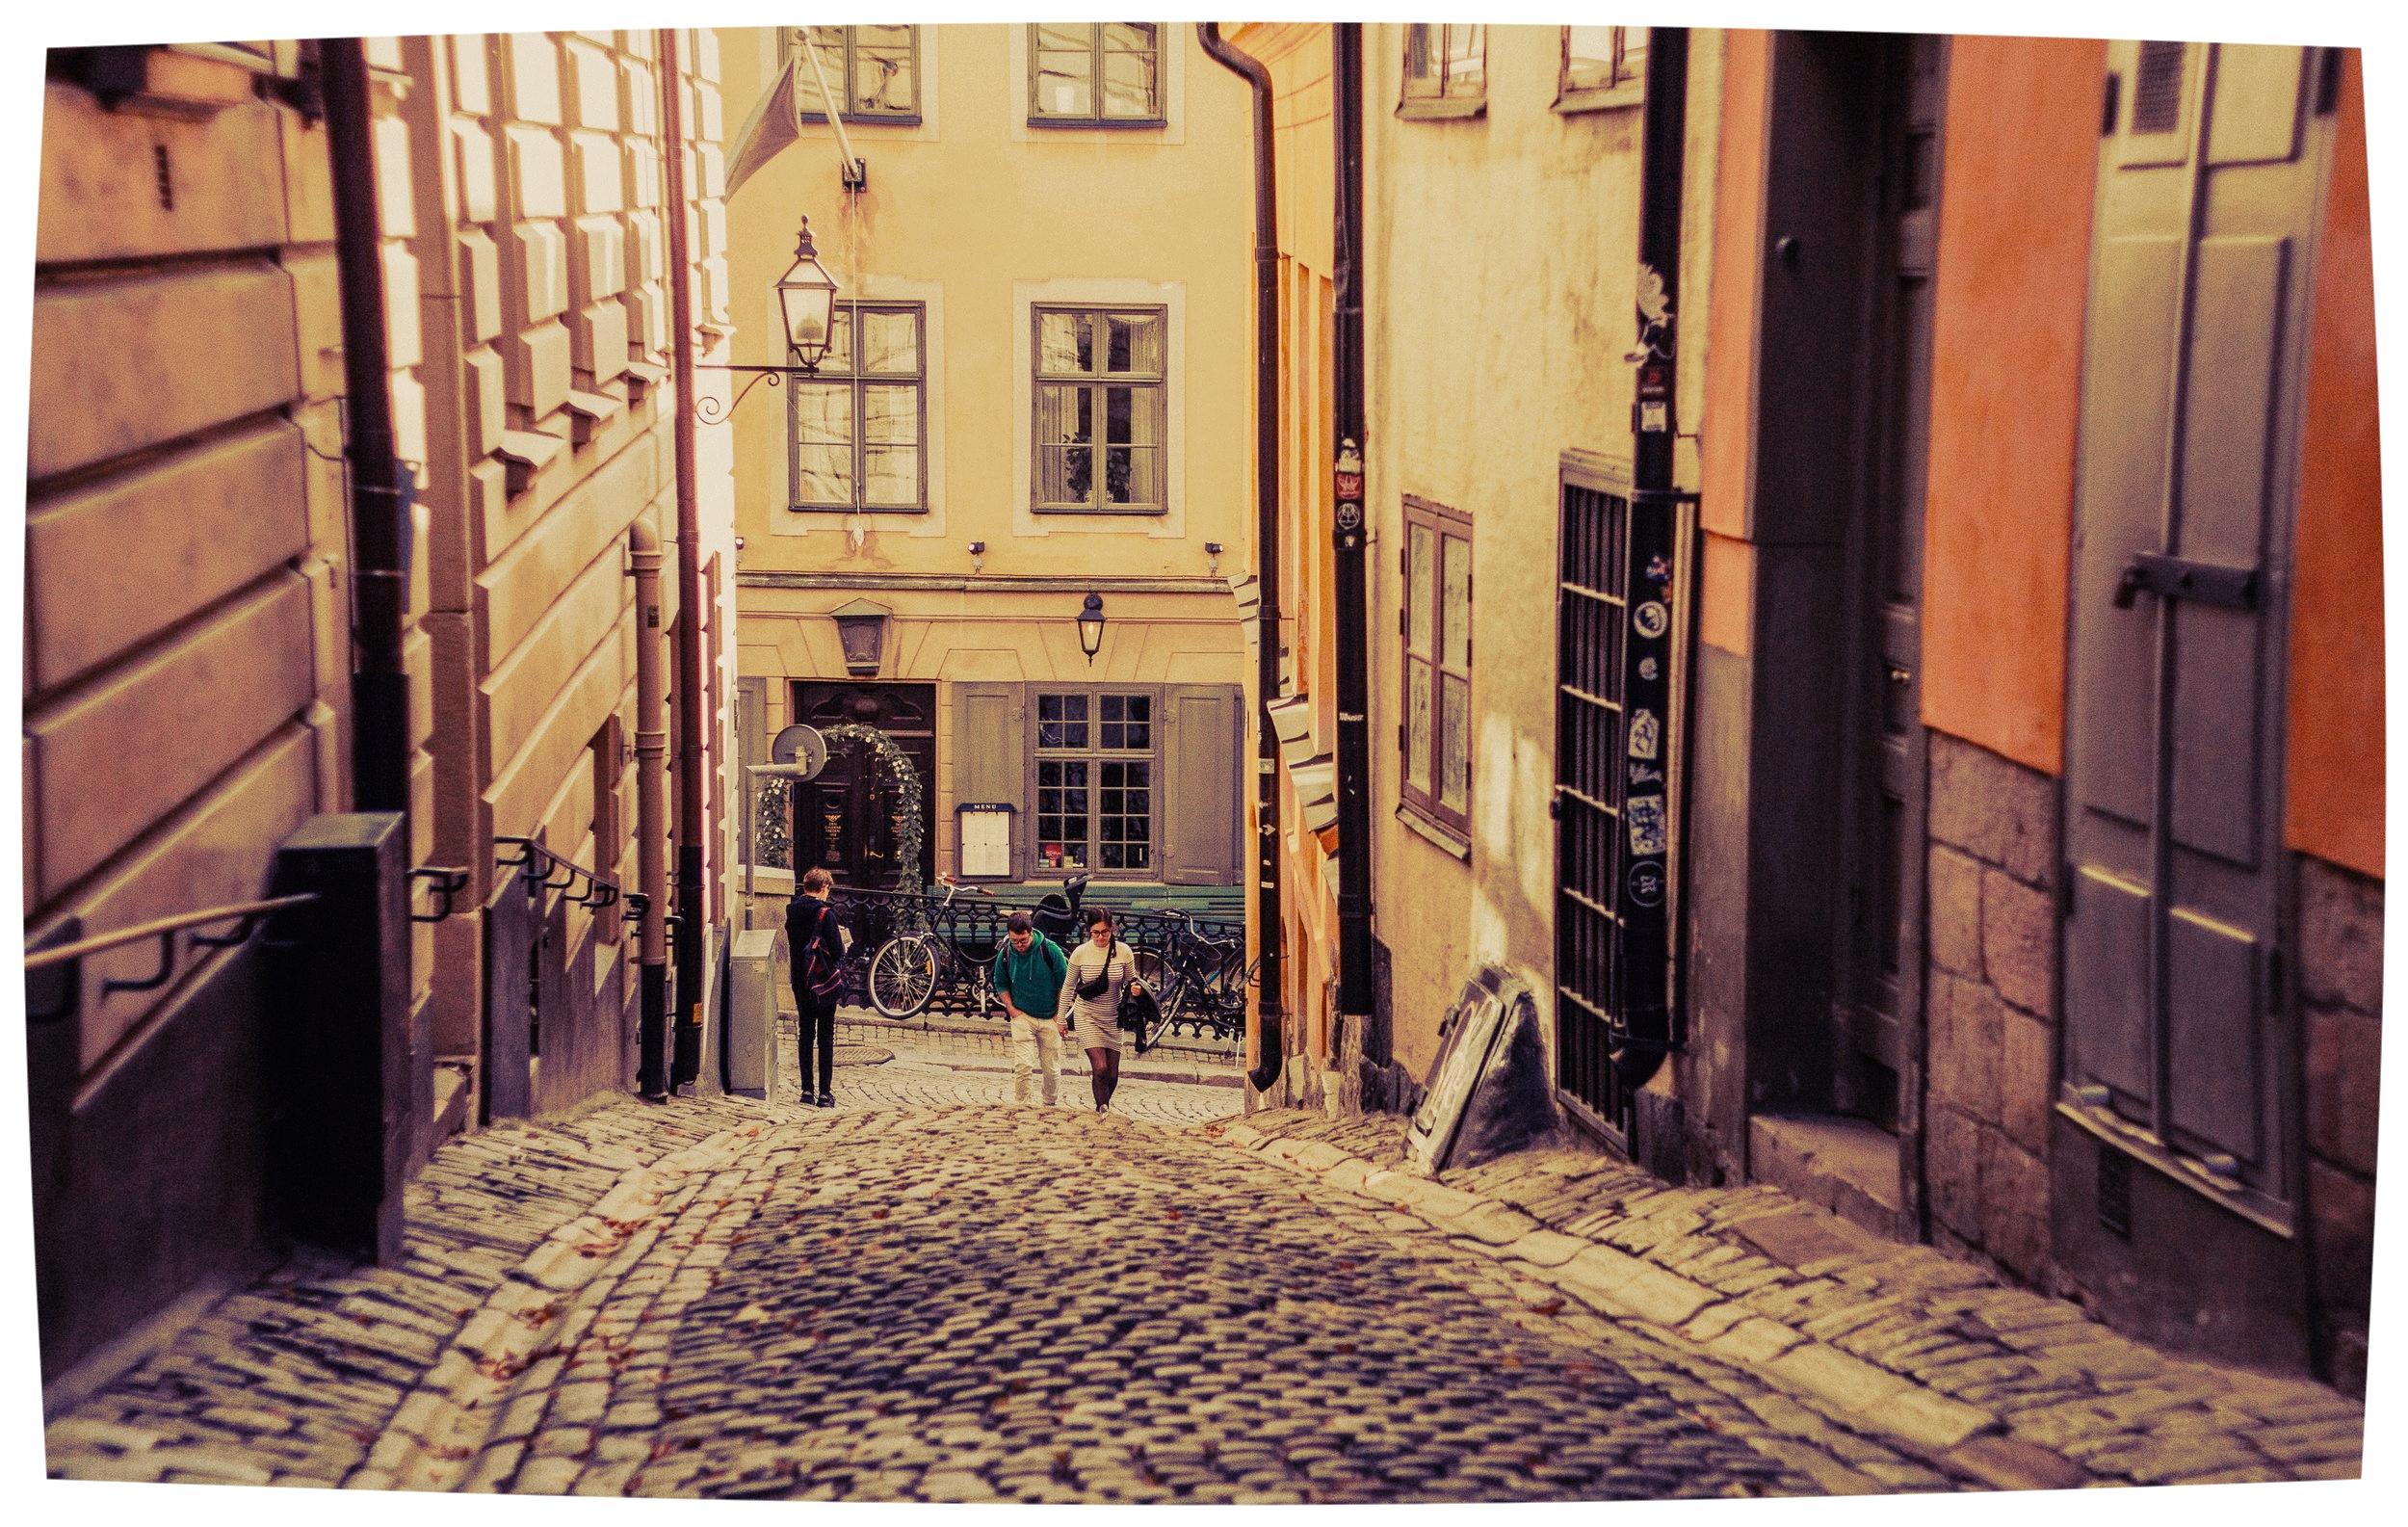 Stockholm's Gamla Stan is Instagram heaven. Photo credit Alina Kovalchuk